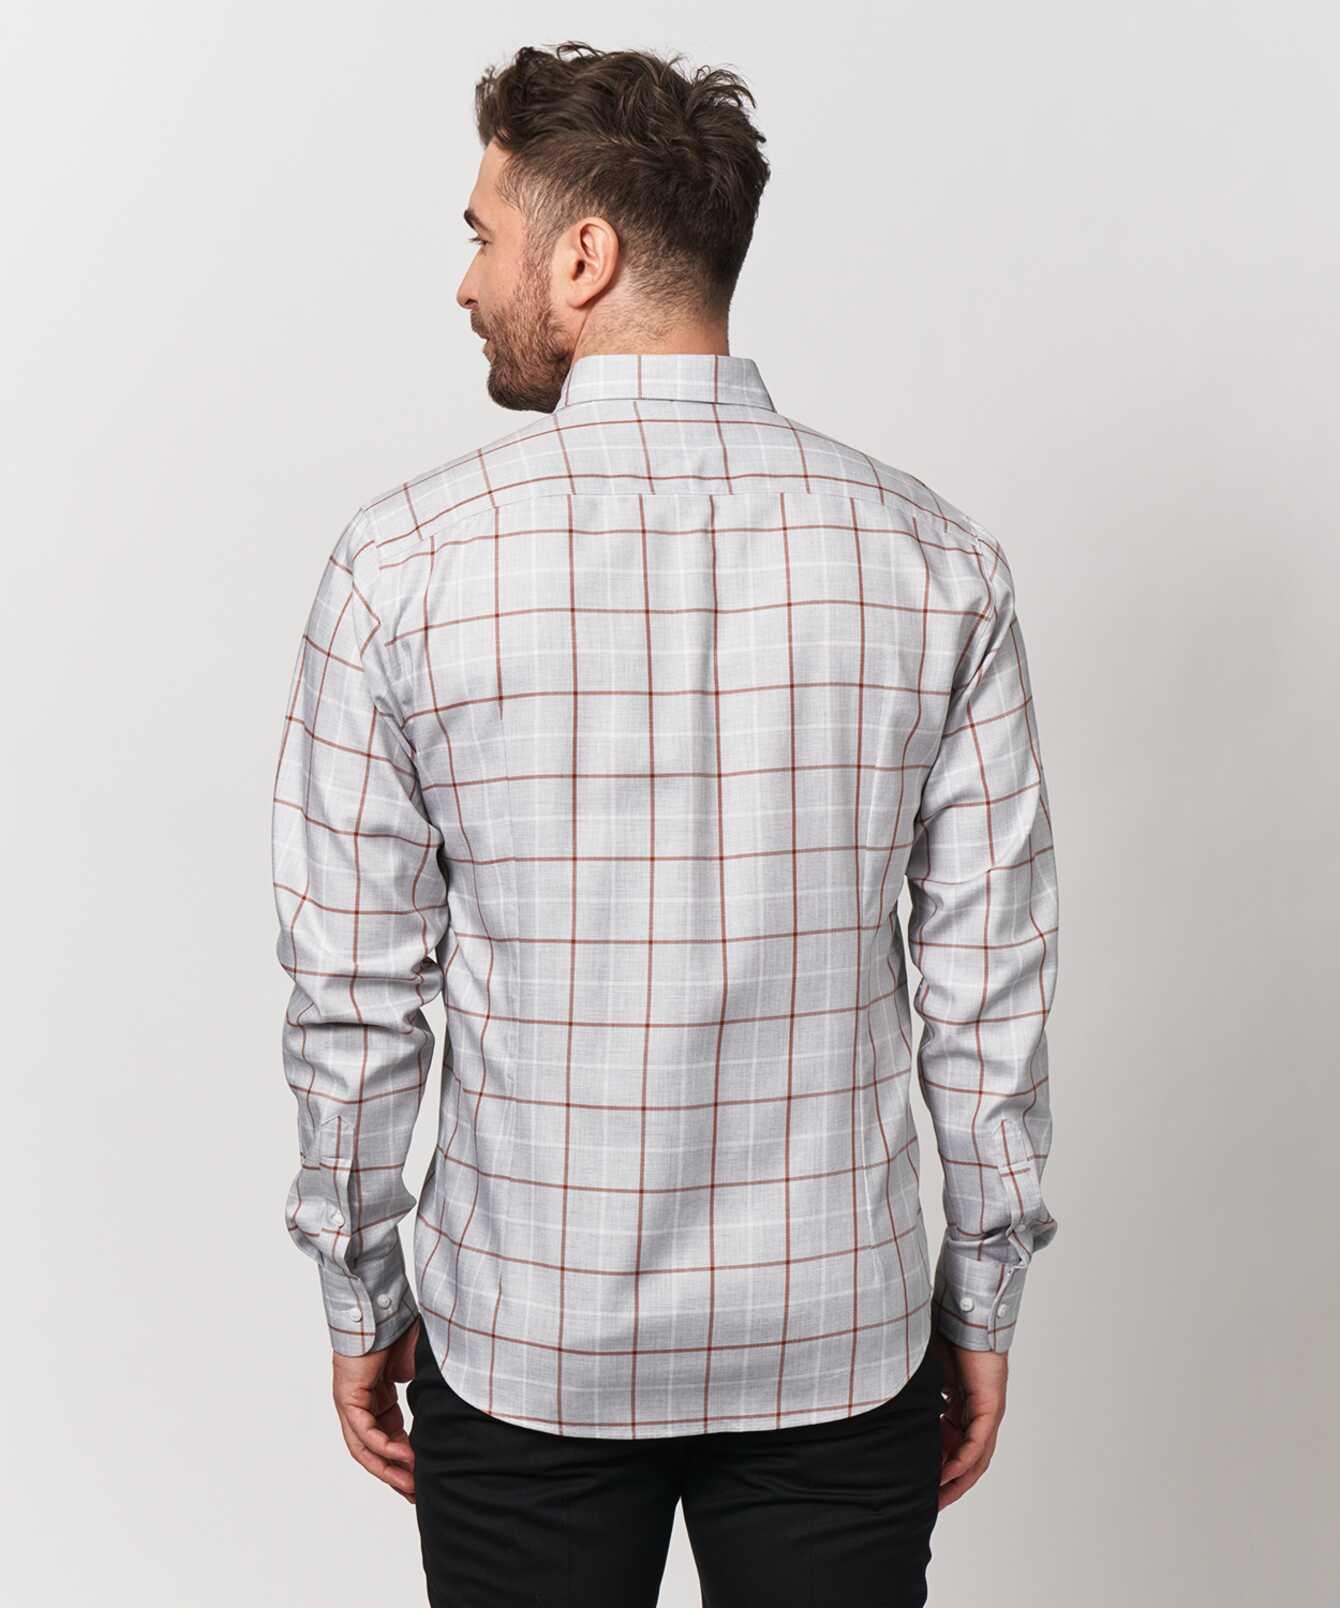 Shirt Lincoln Brun The Shirt Factory